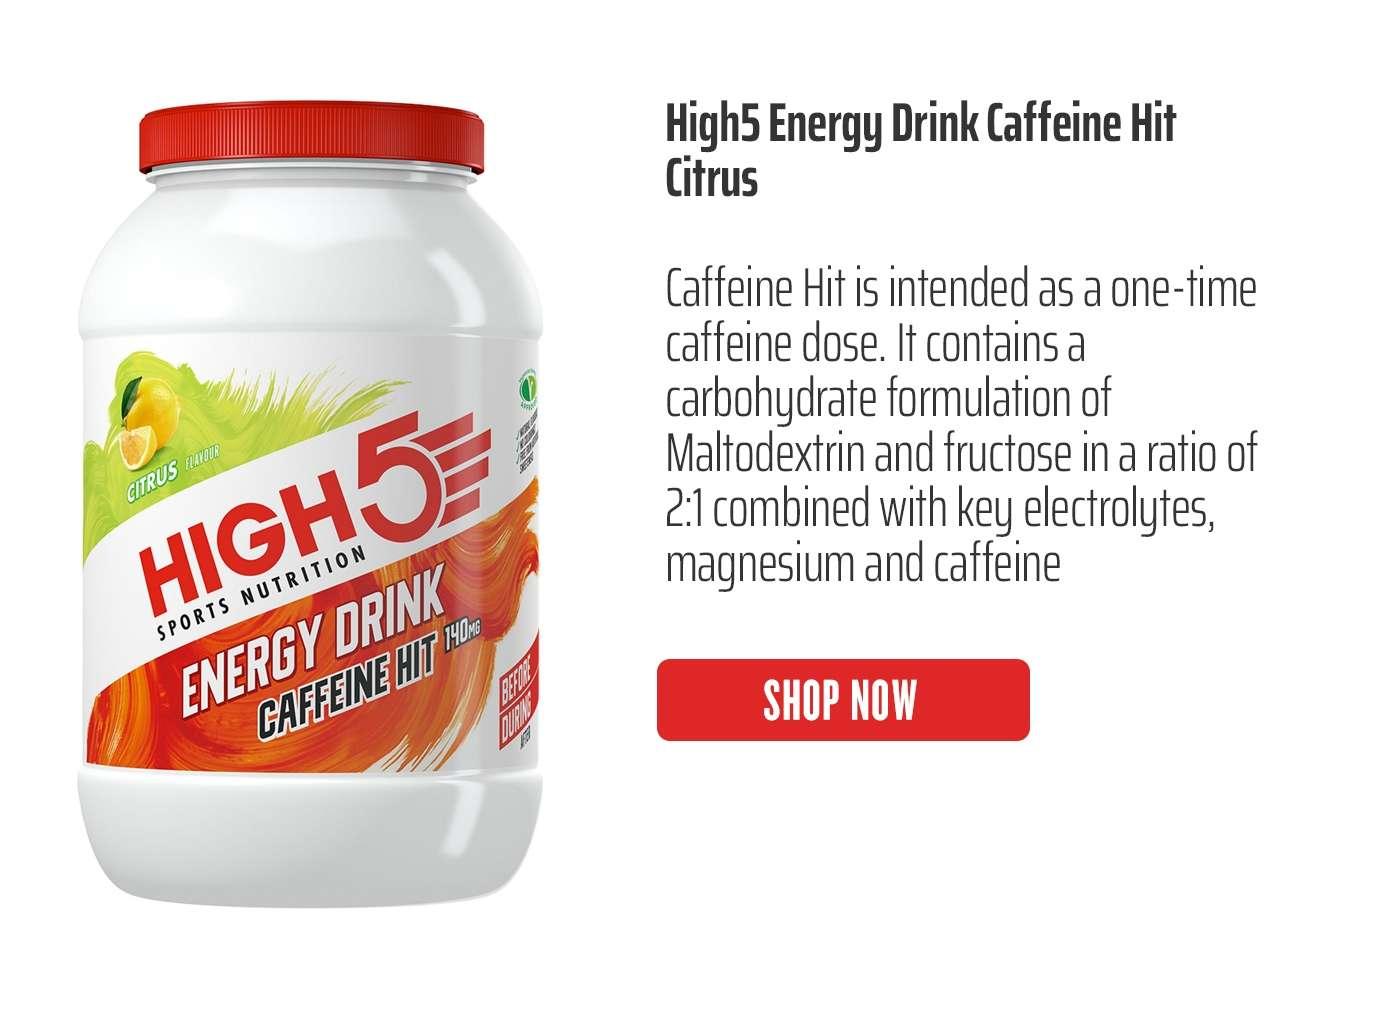 High5 Energy Drink Caffeine Hit Citrus